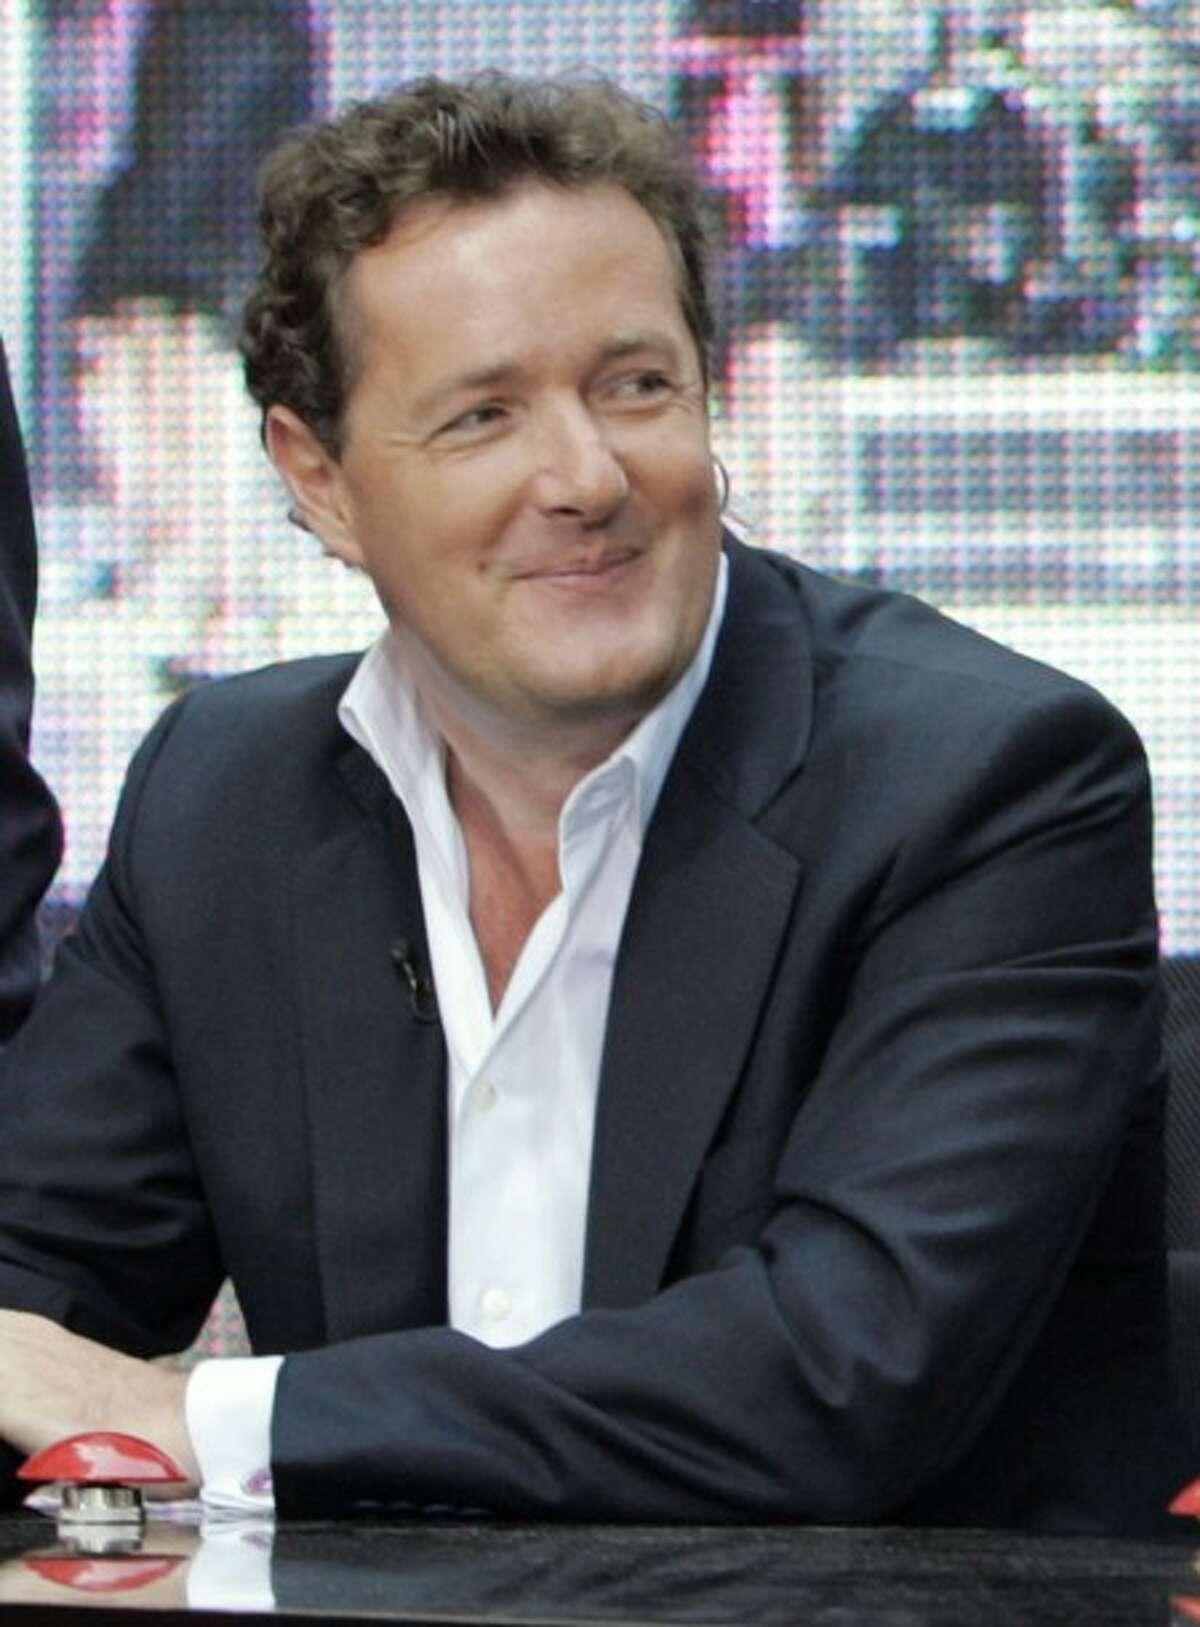 Piers Morgan, celebrity judge of the NBC televison program